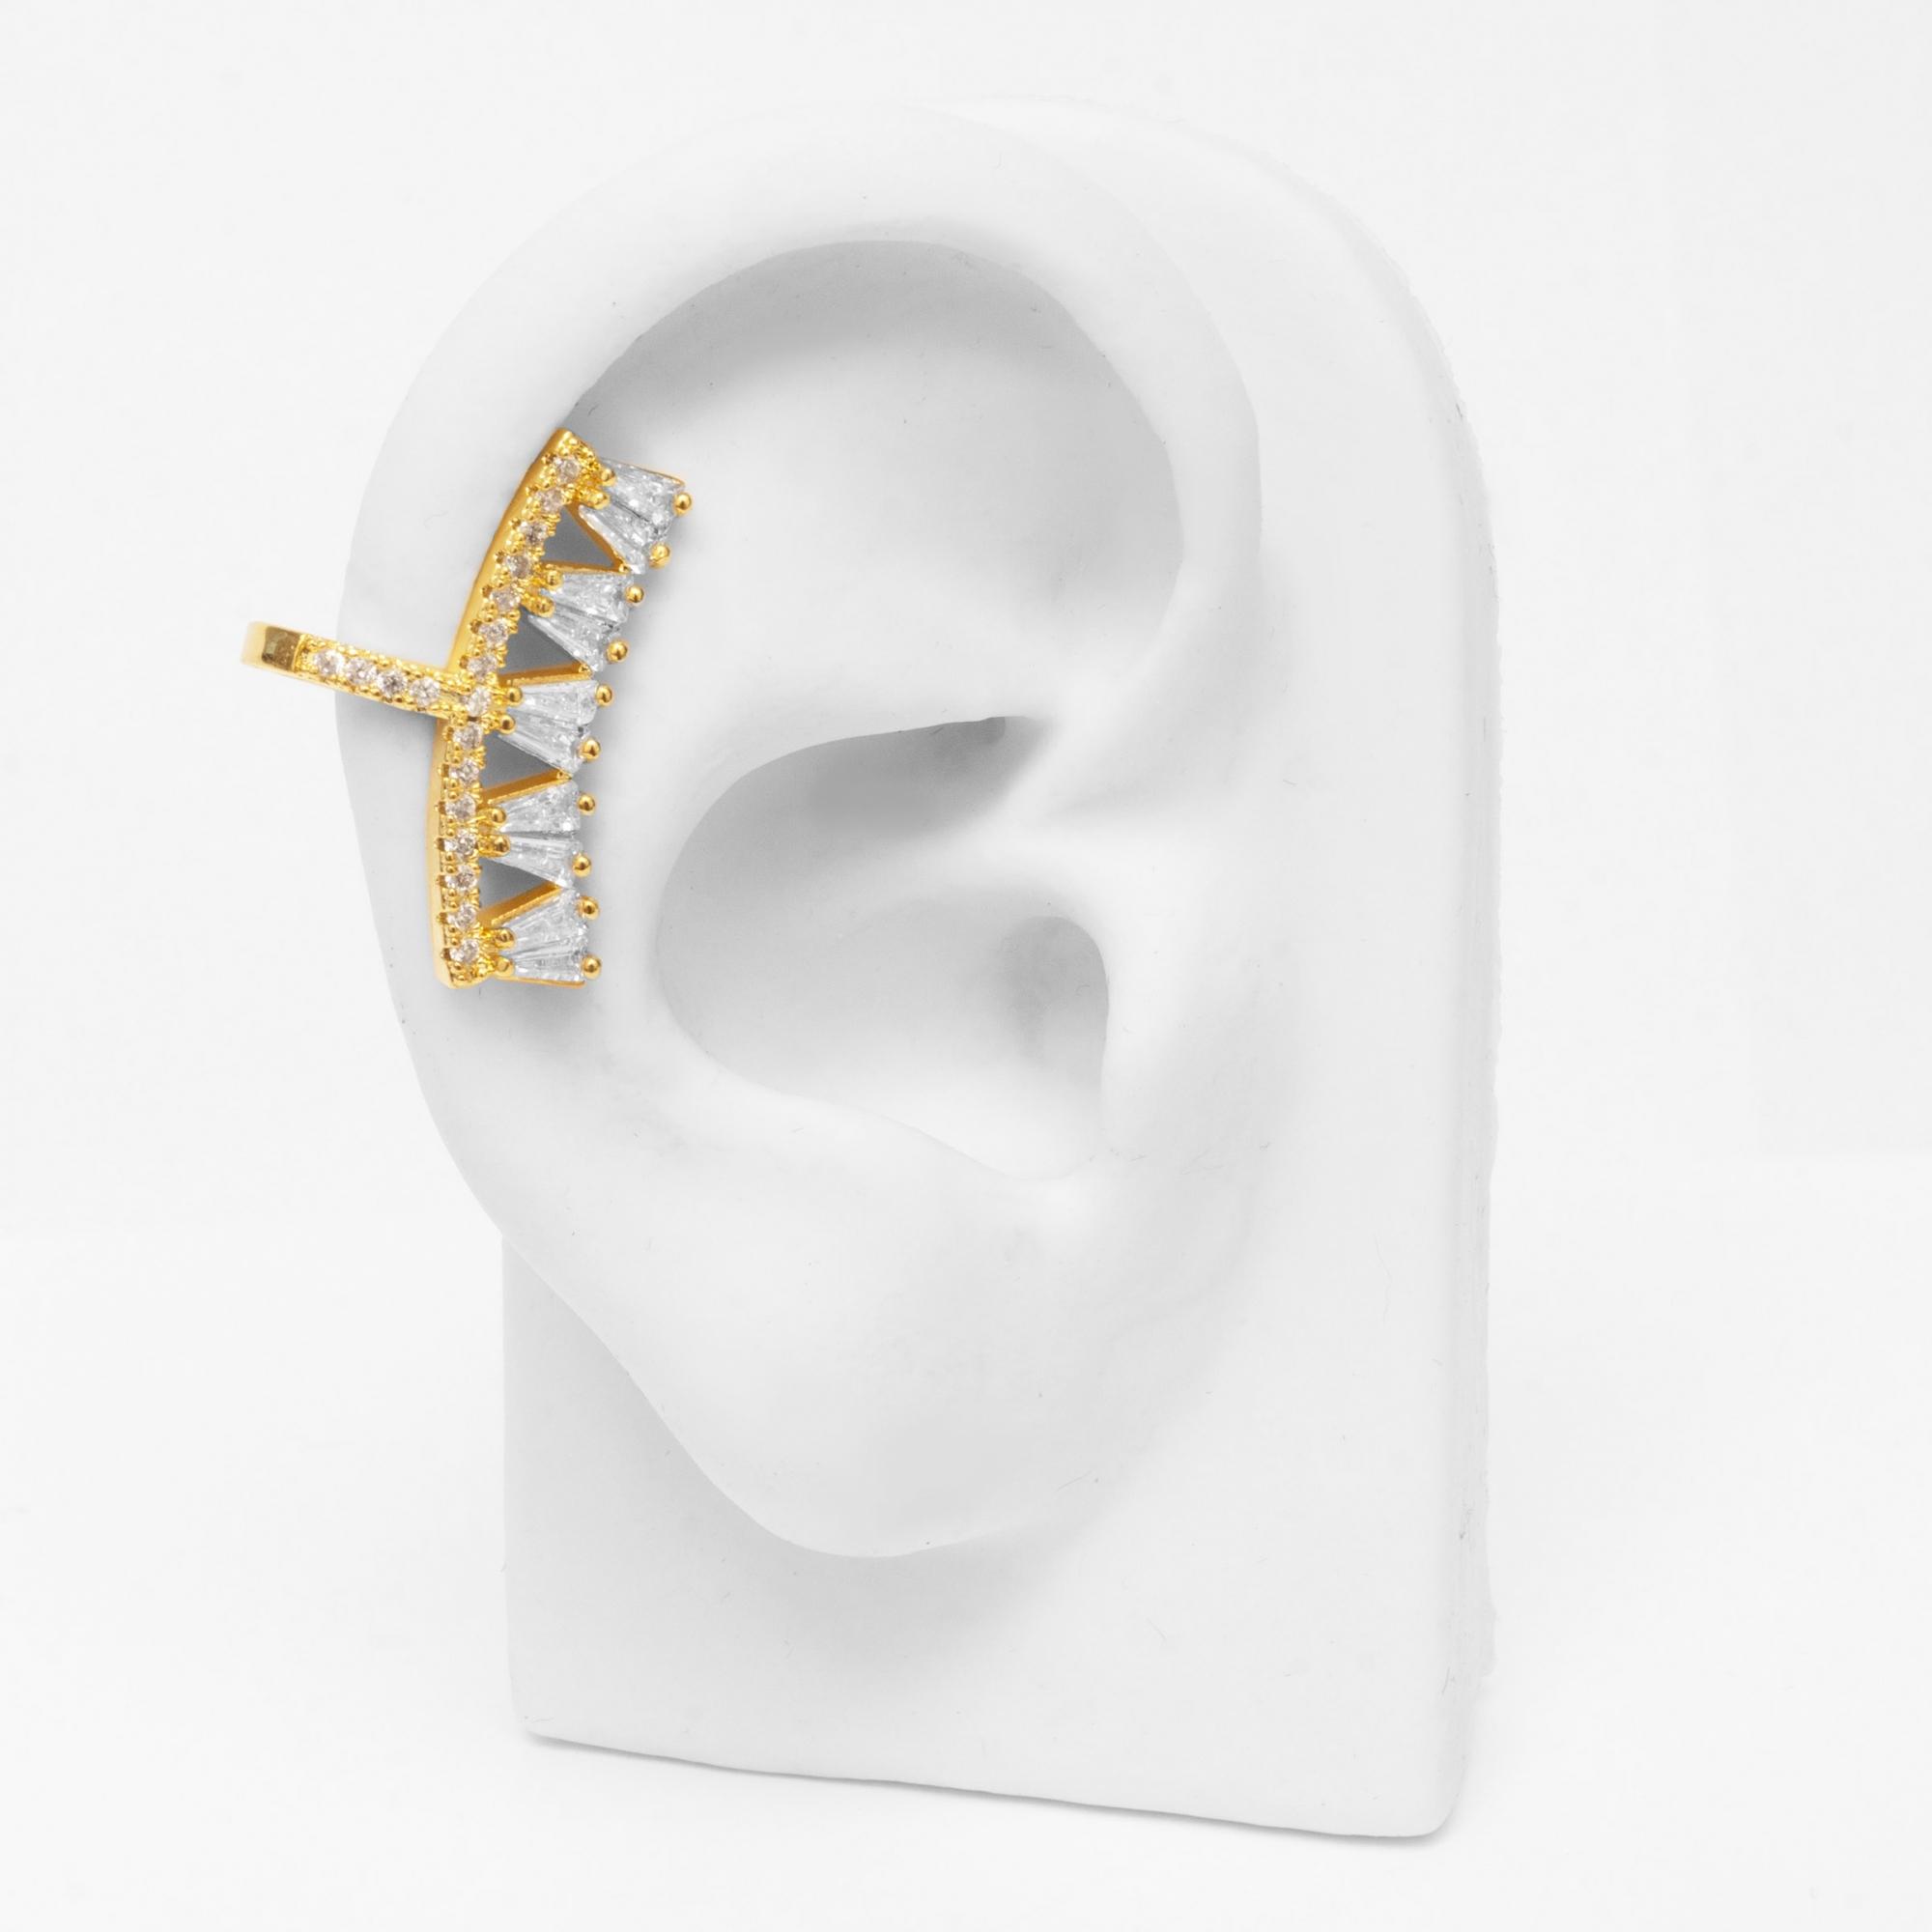 Brinco Piercing Fake Ear Cuff Zircônias Folheado a Ouro 18k  - Lunozê Joias